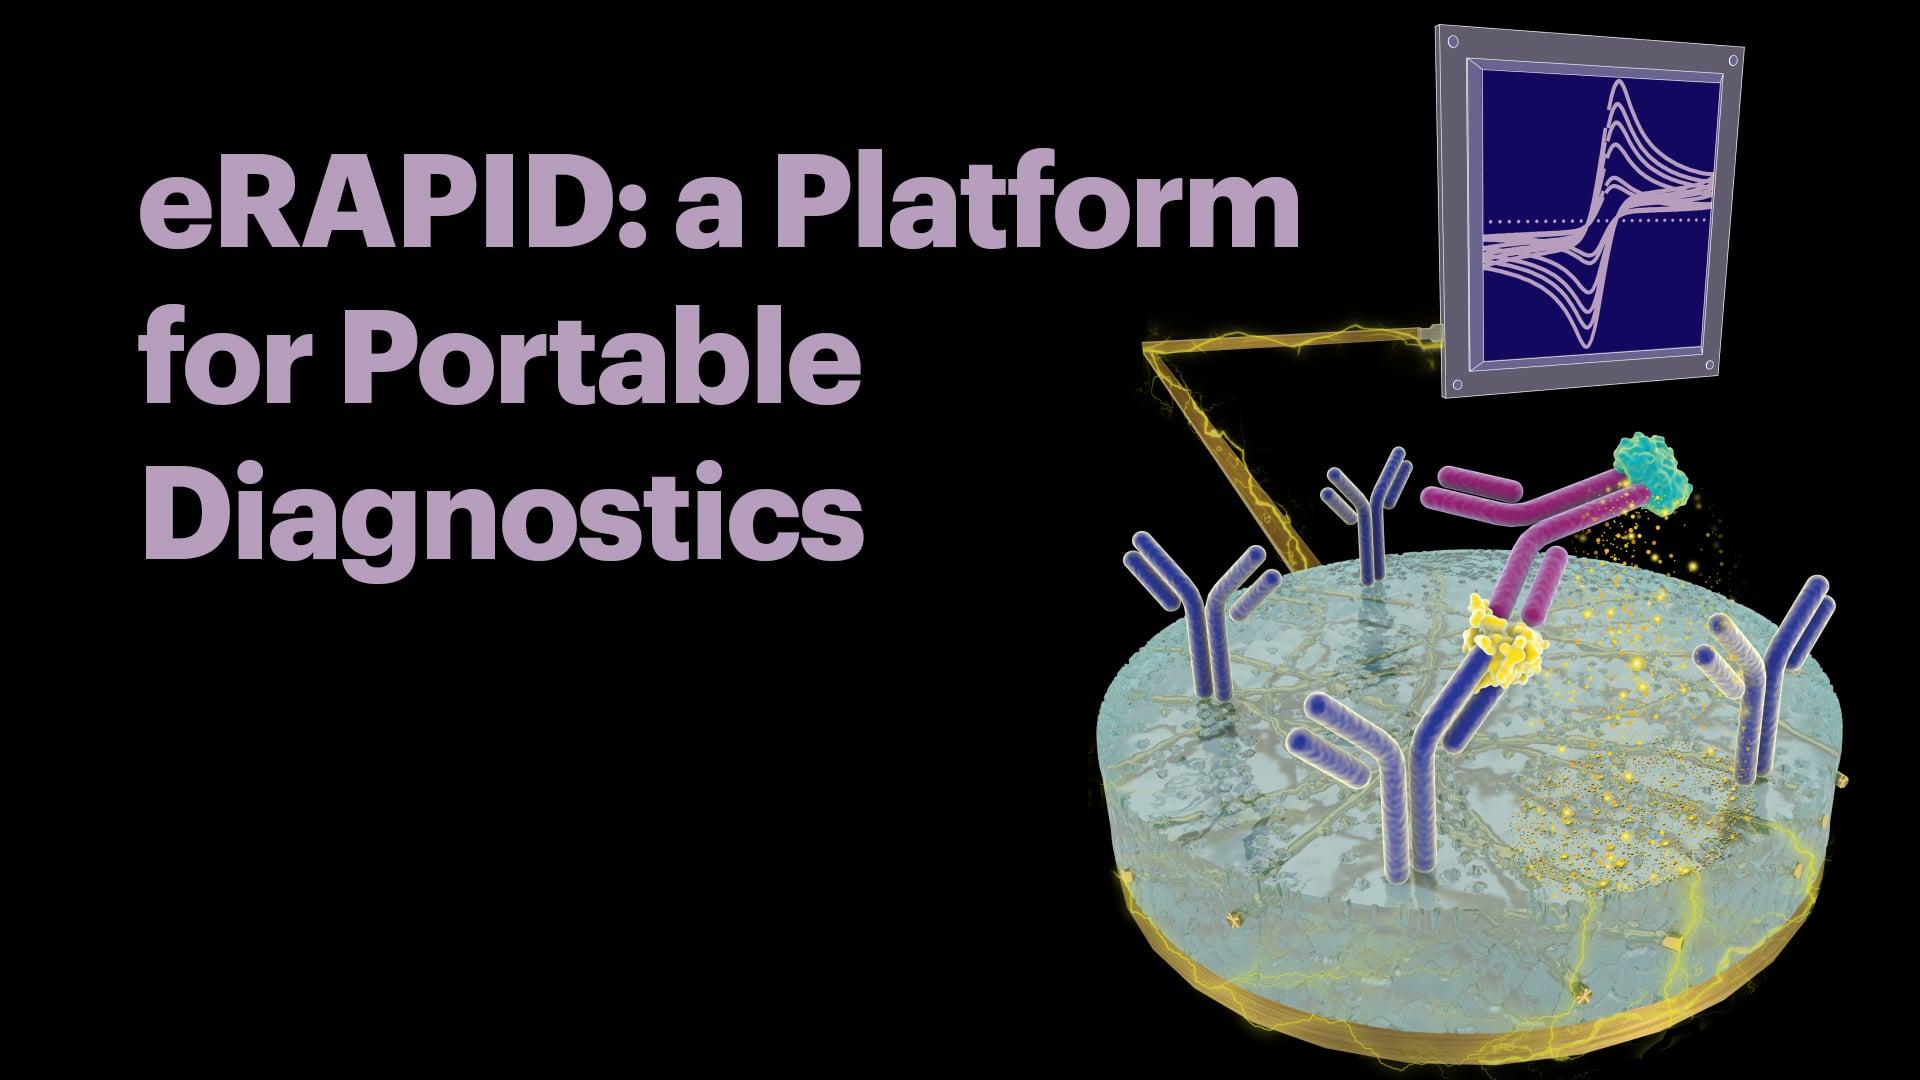 eRAPID: a Platform for Portable Diagnostics